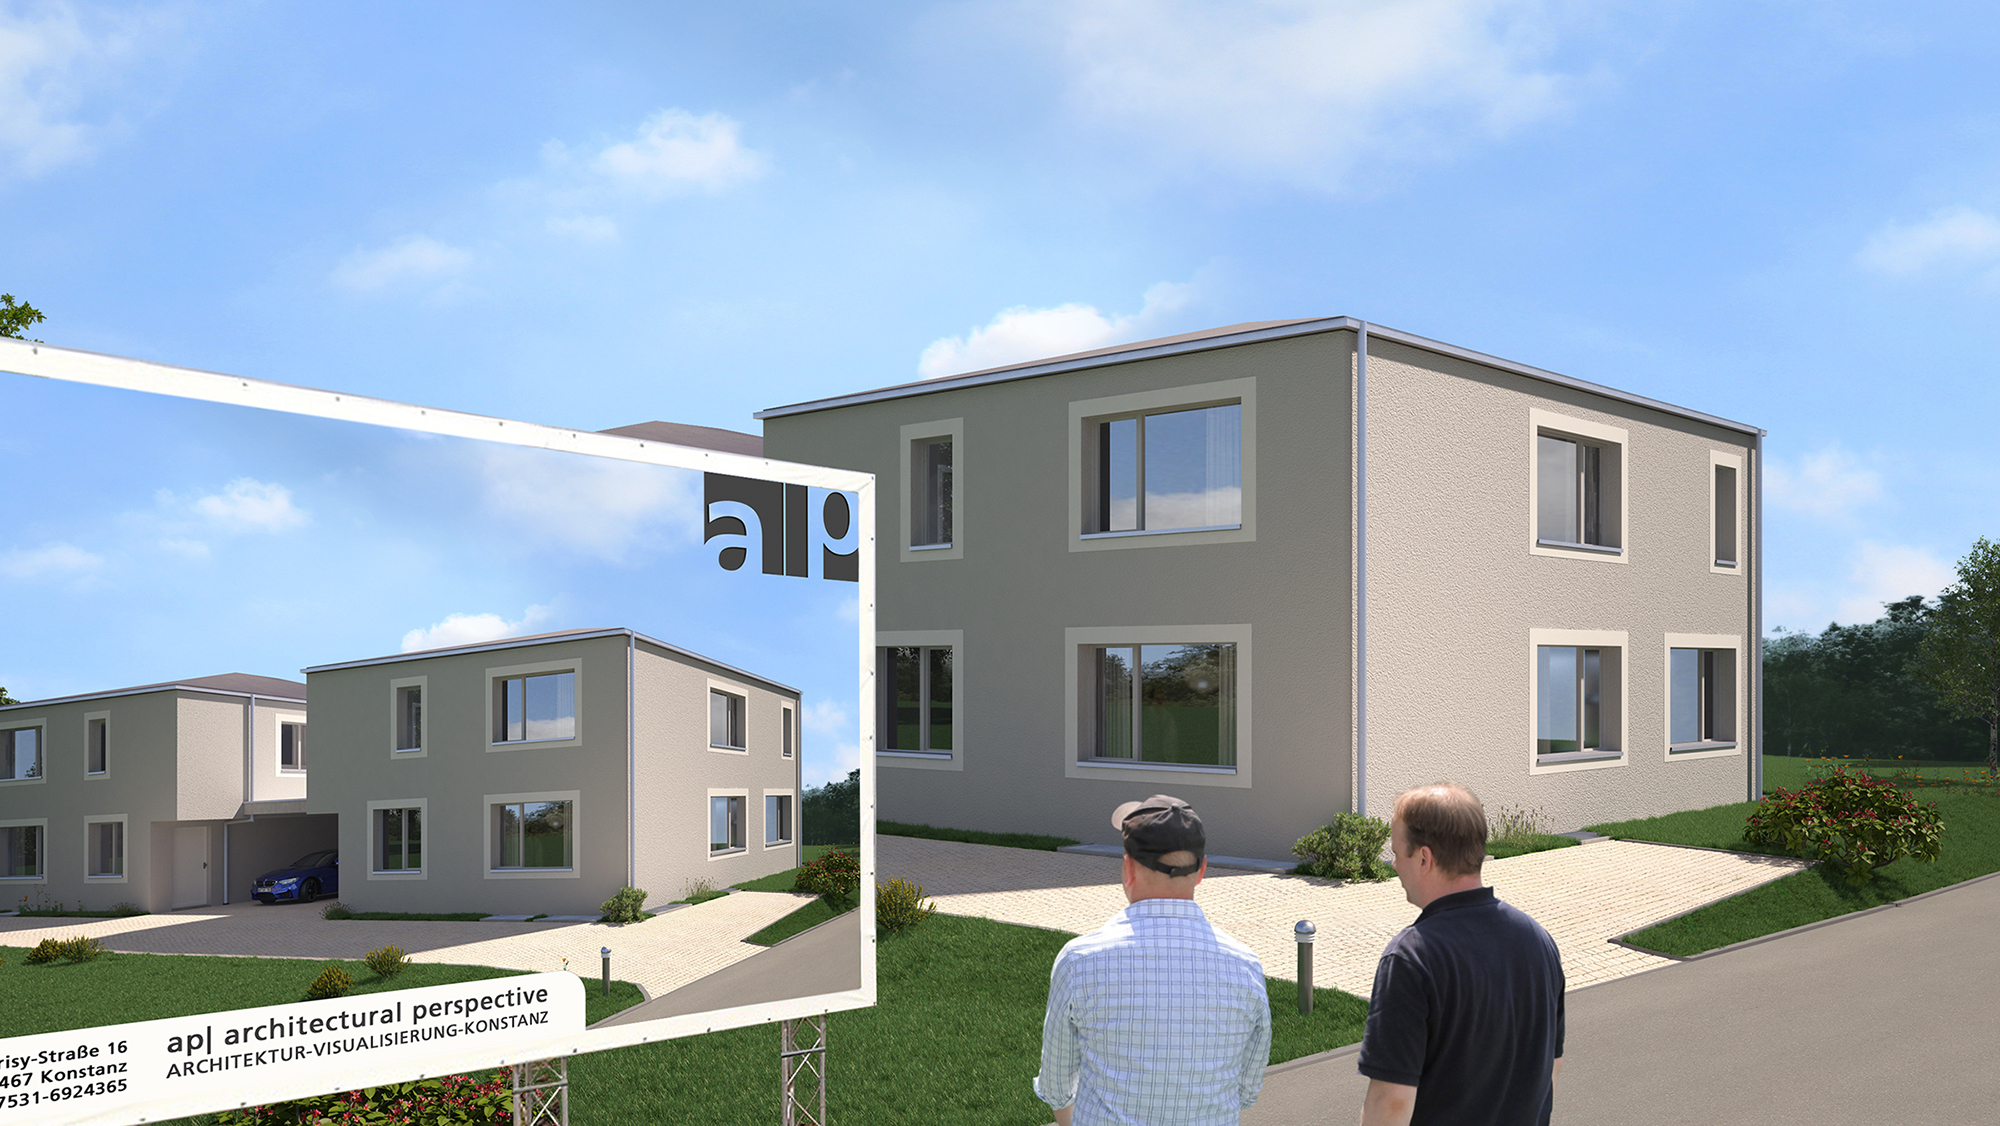 Anjana Perera Visualisierung Goldenägger, Amriswil HM-Architektur AG, Kreuzlingen